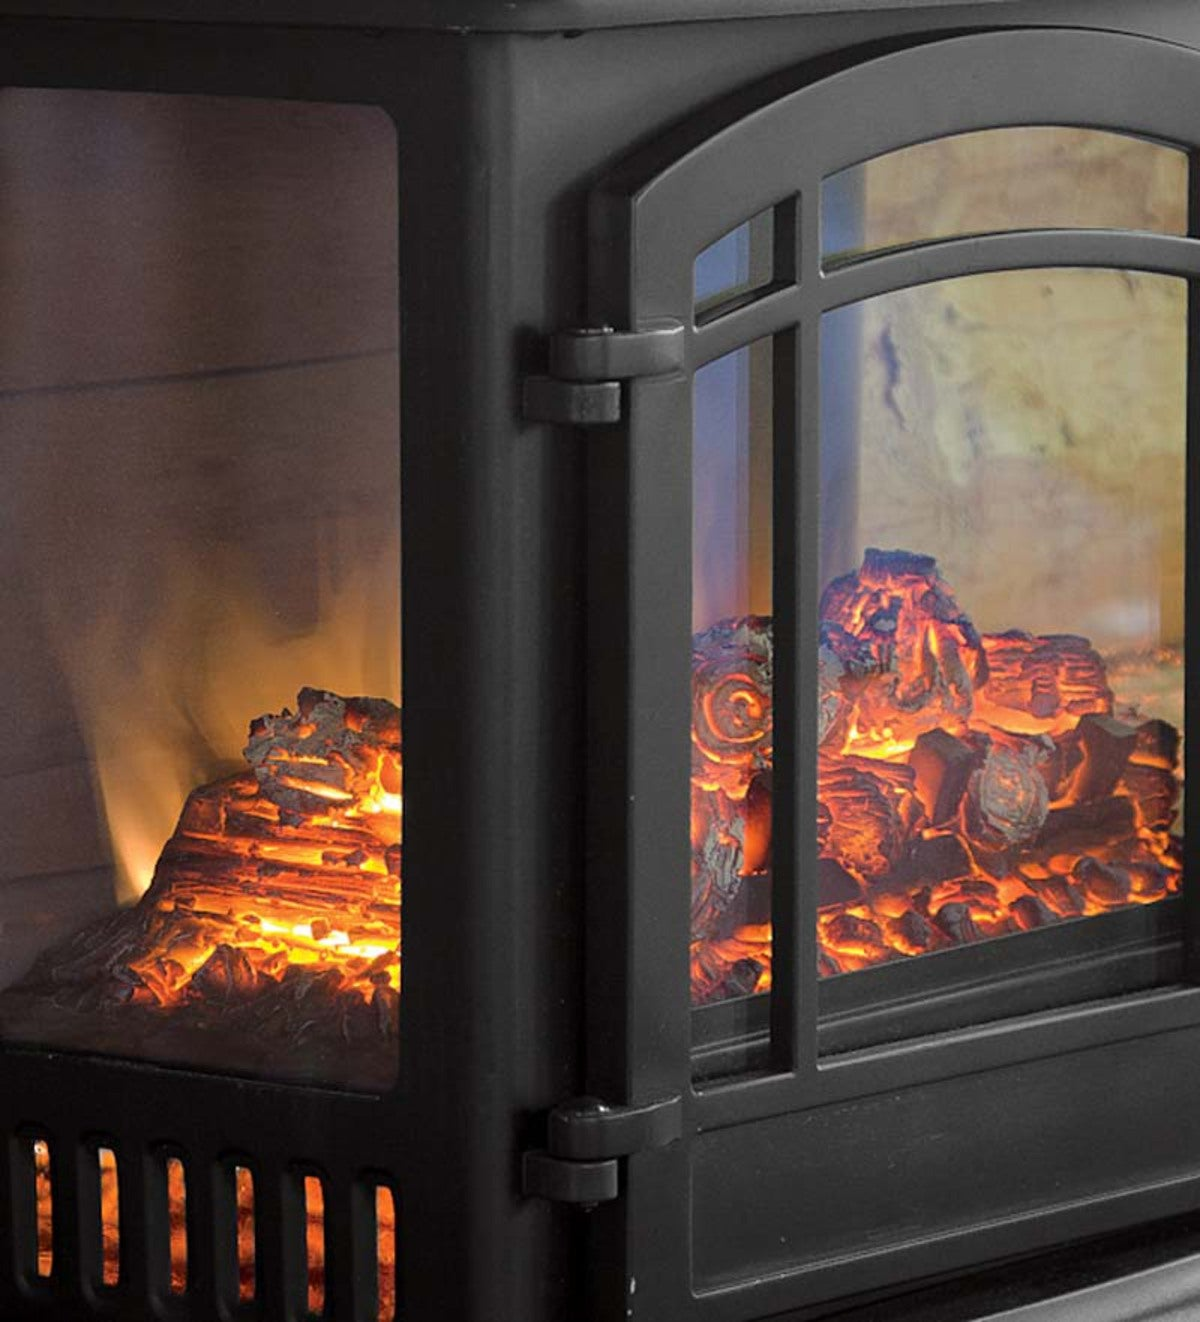 Panoramic Quartz Infrared Stove Heater Black Plowhearth